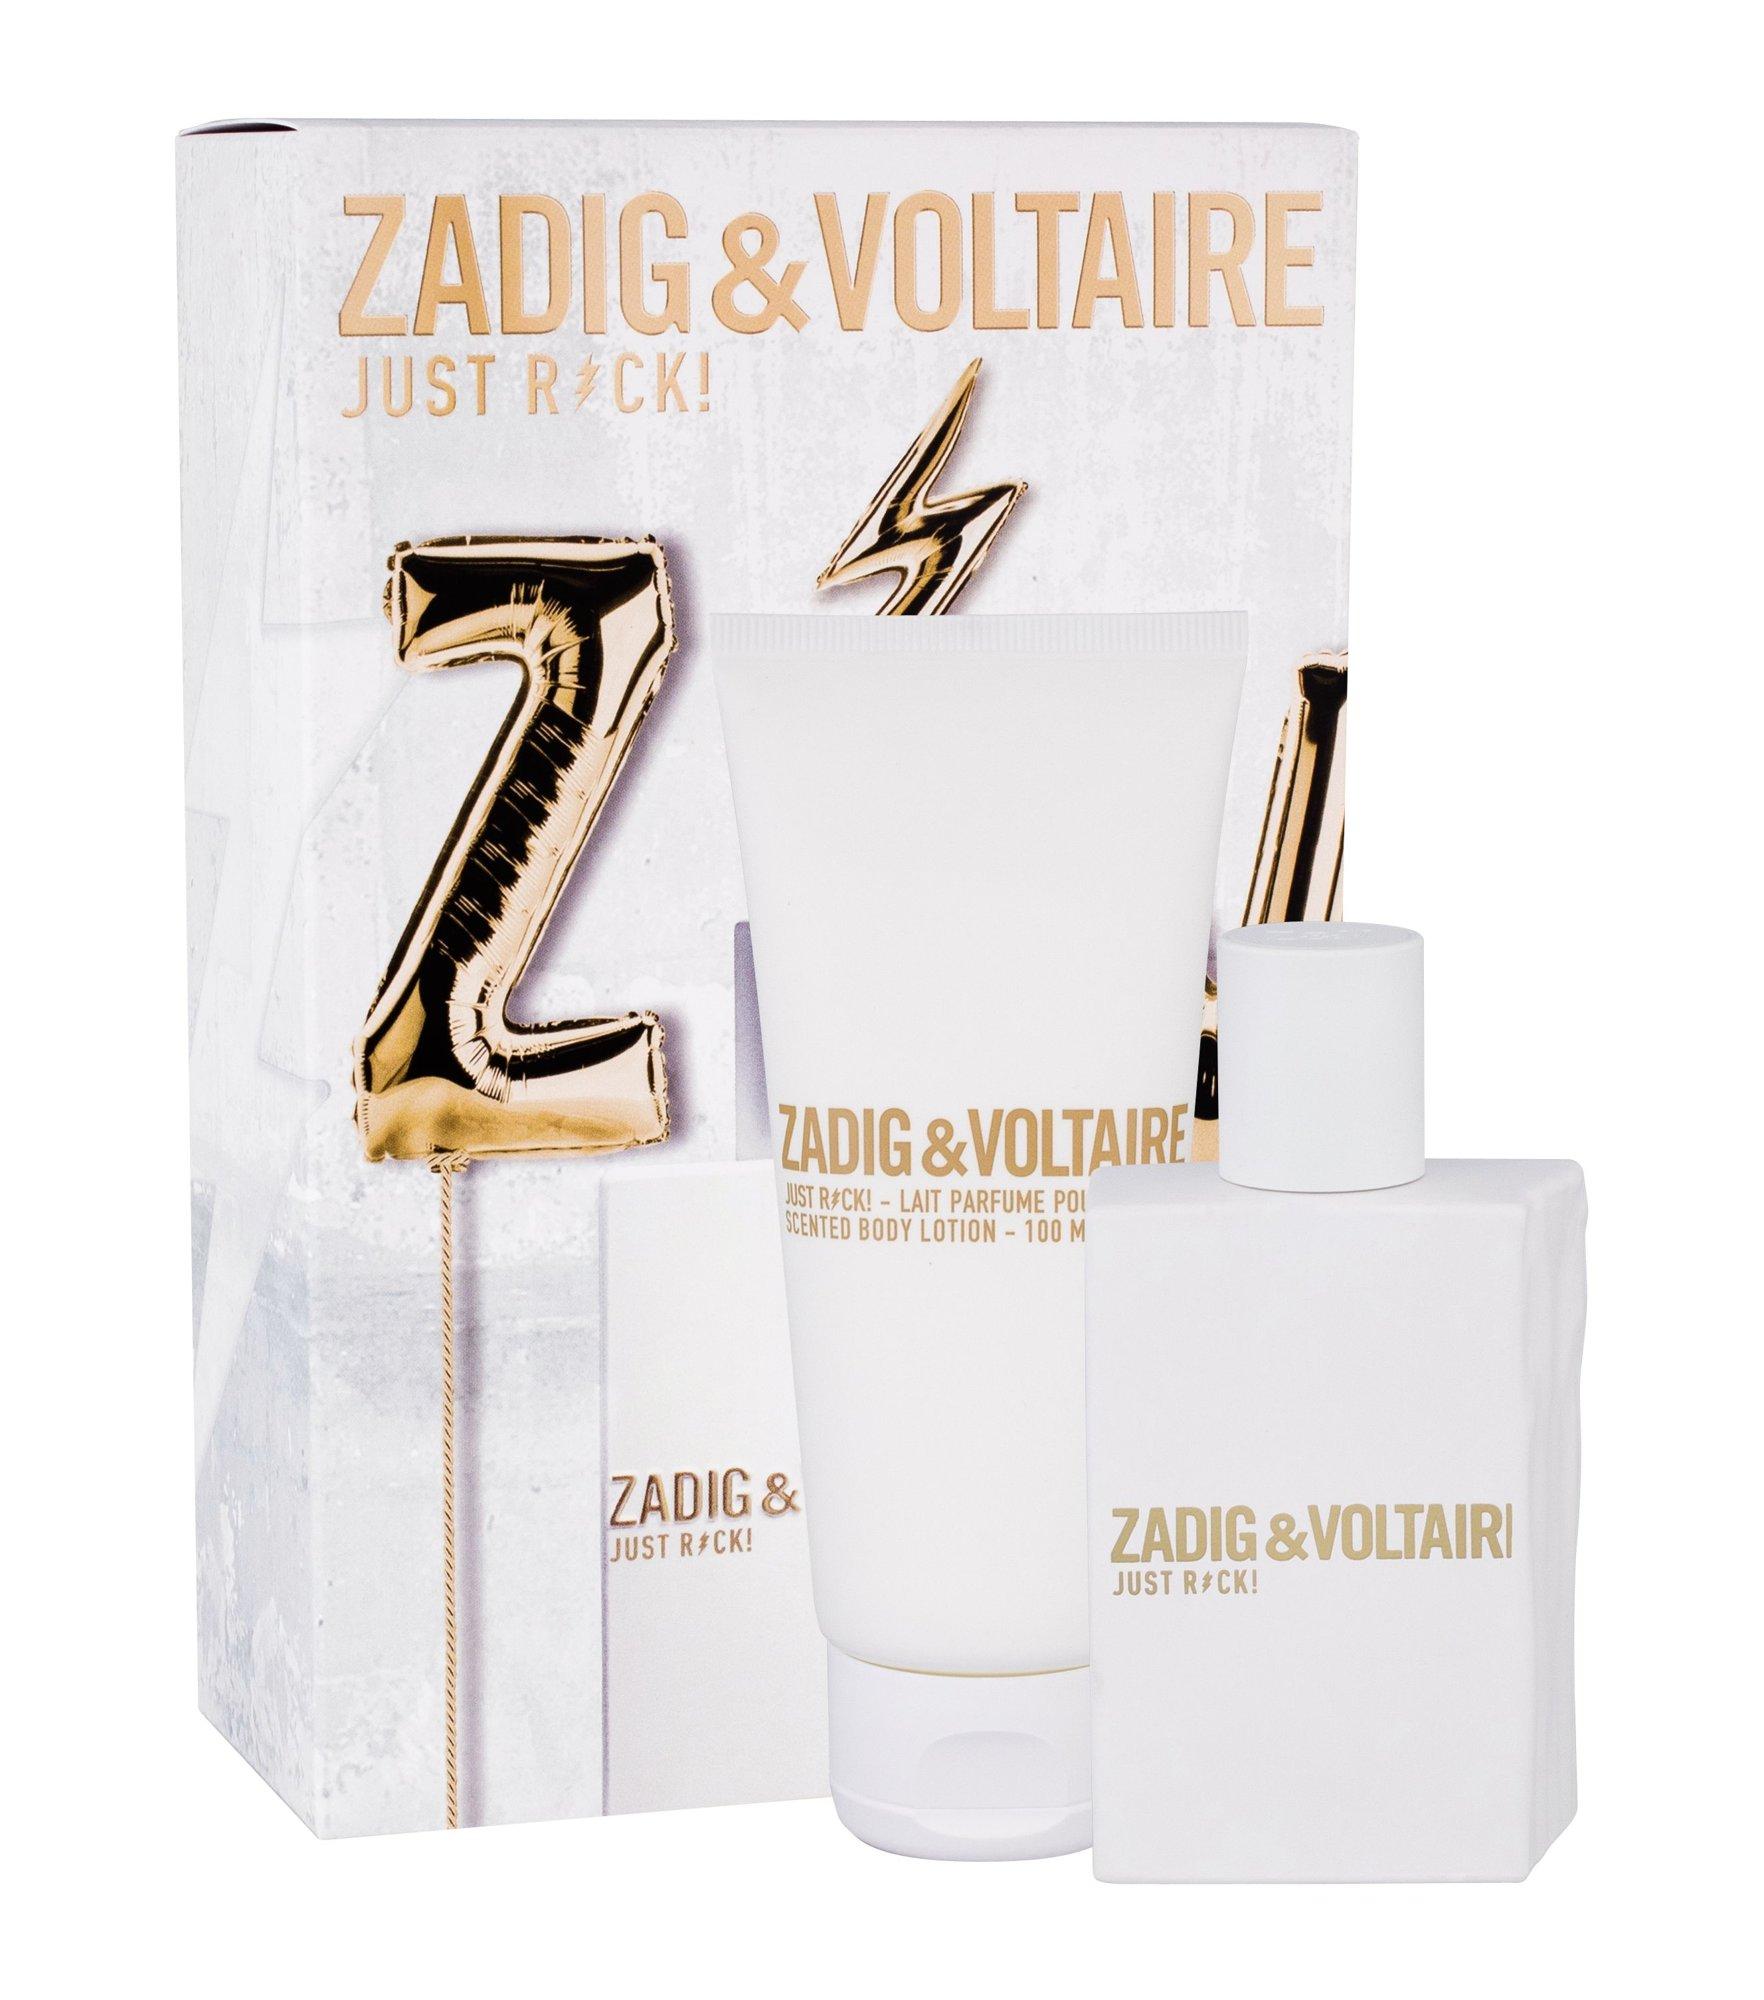 Zadig & Voltaire Just Rock! Eau de Parfum 50ml